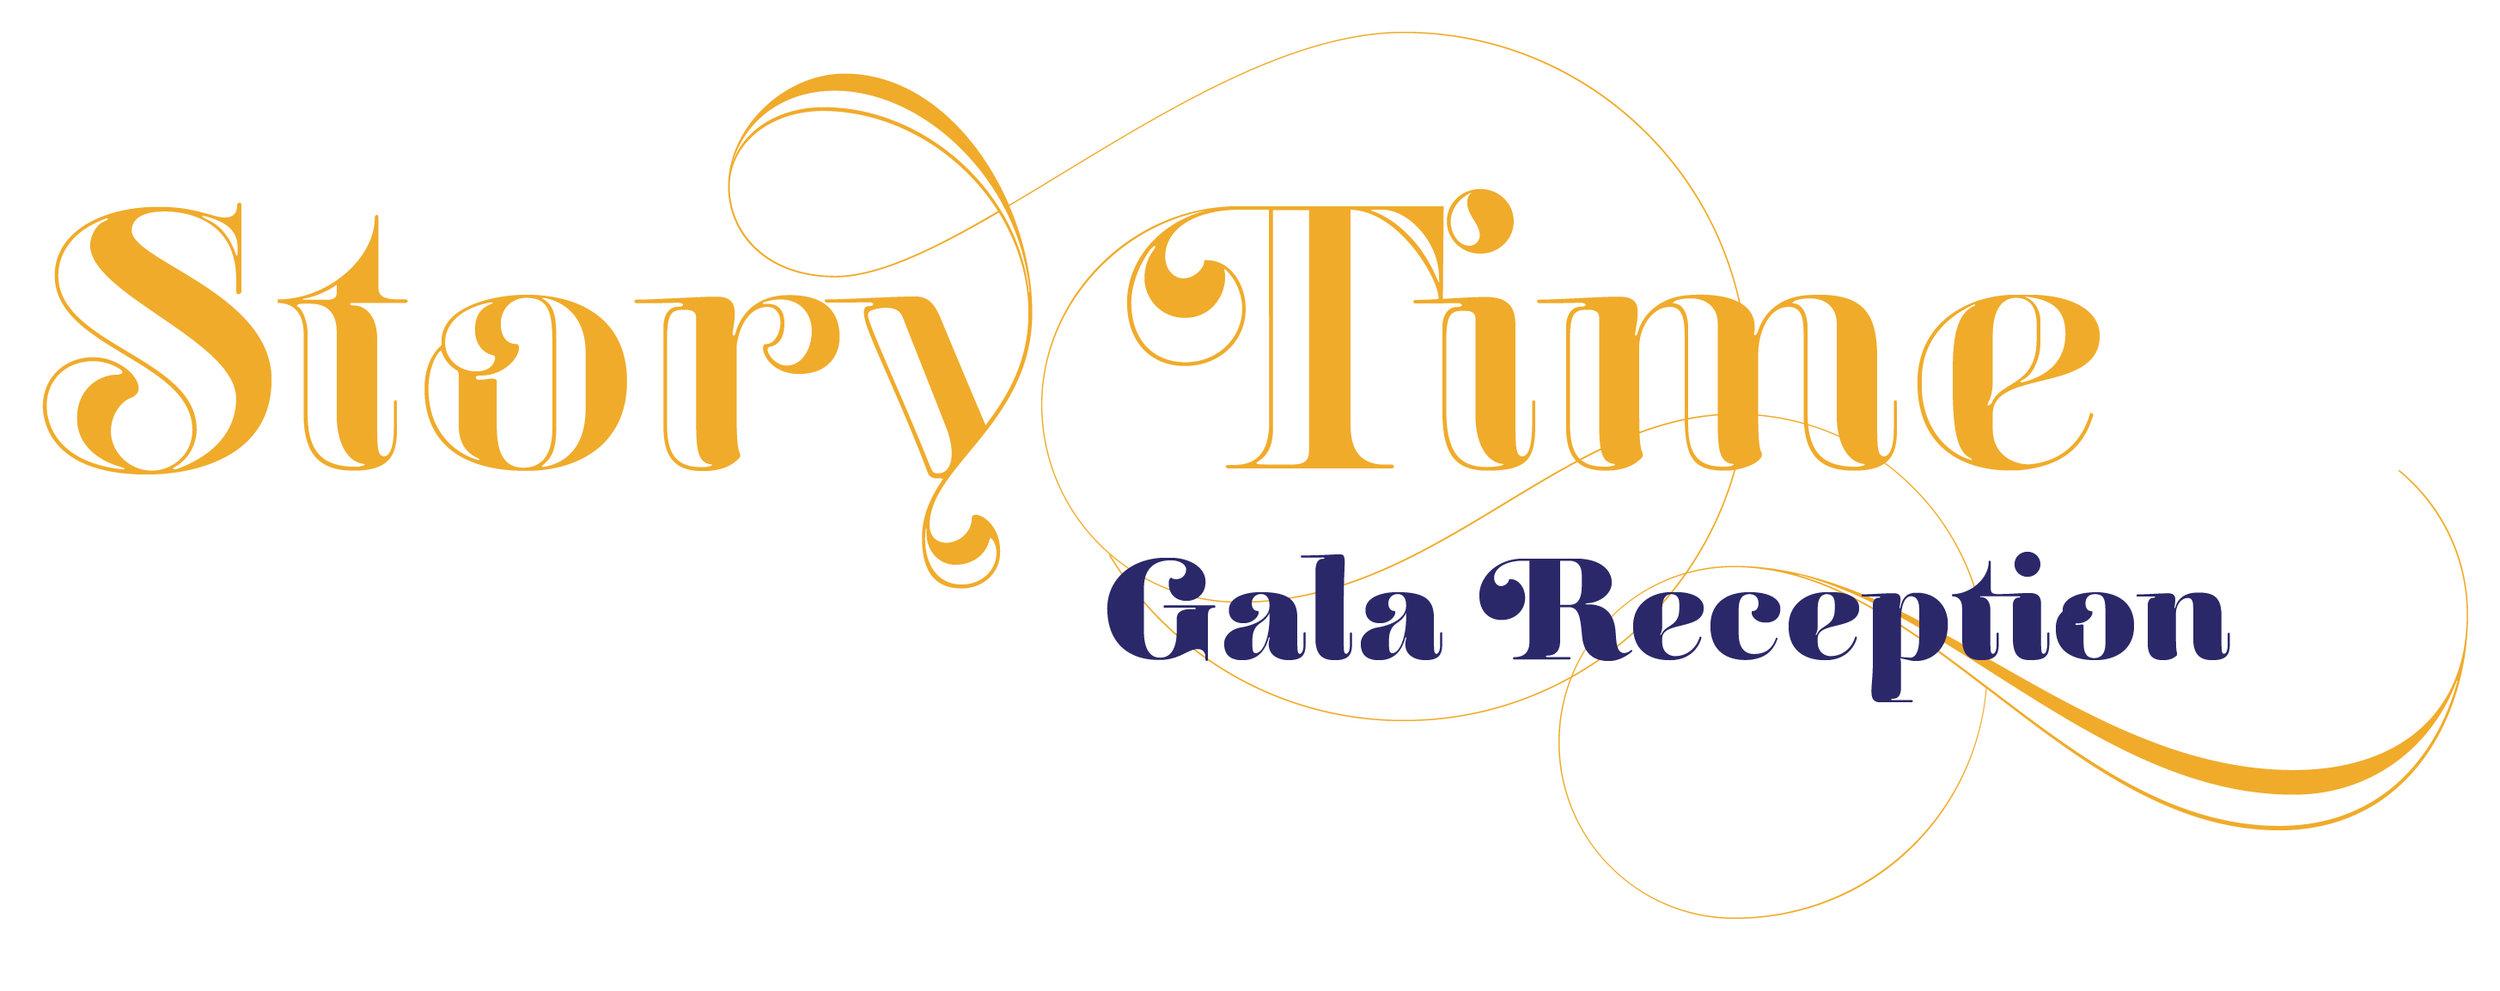 Storytime Gala logo-01.jpg